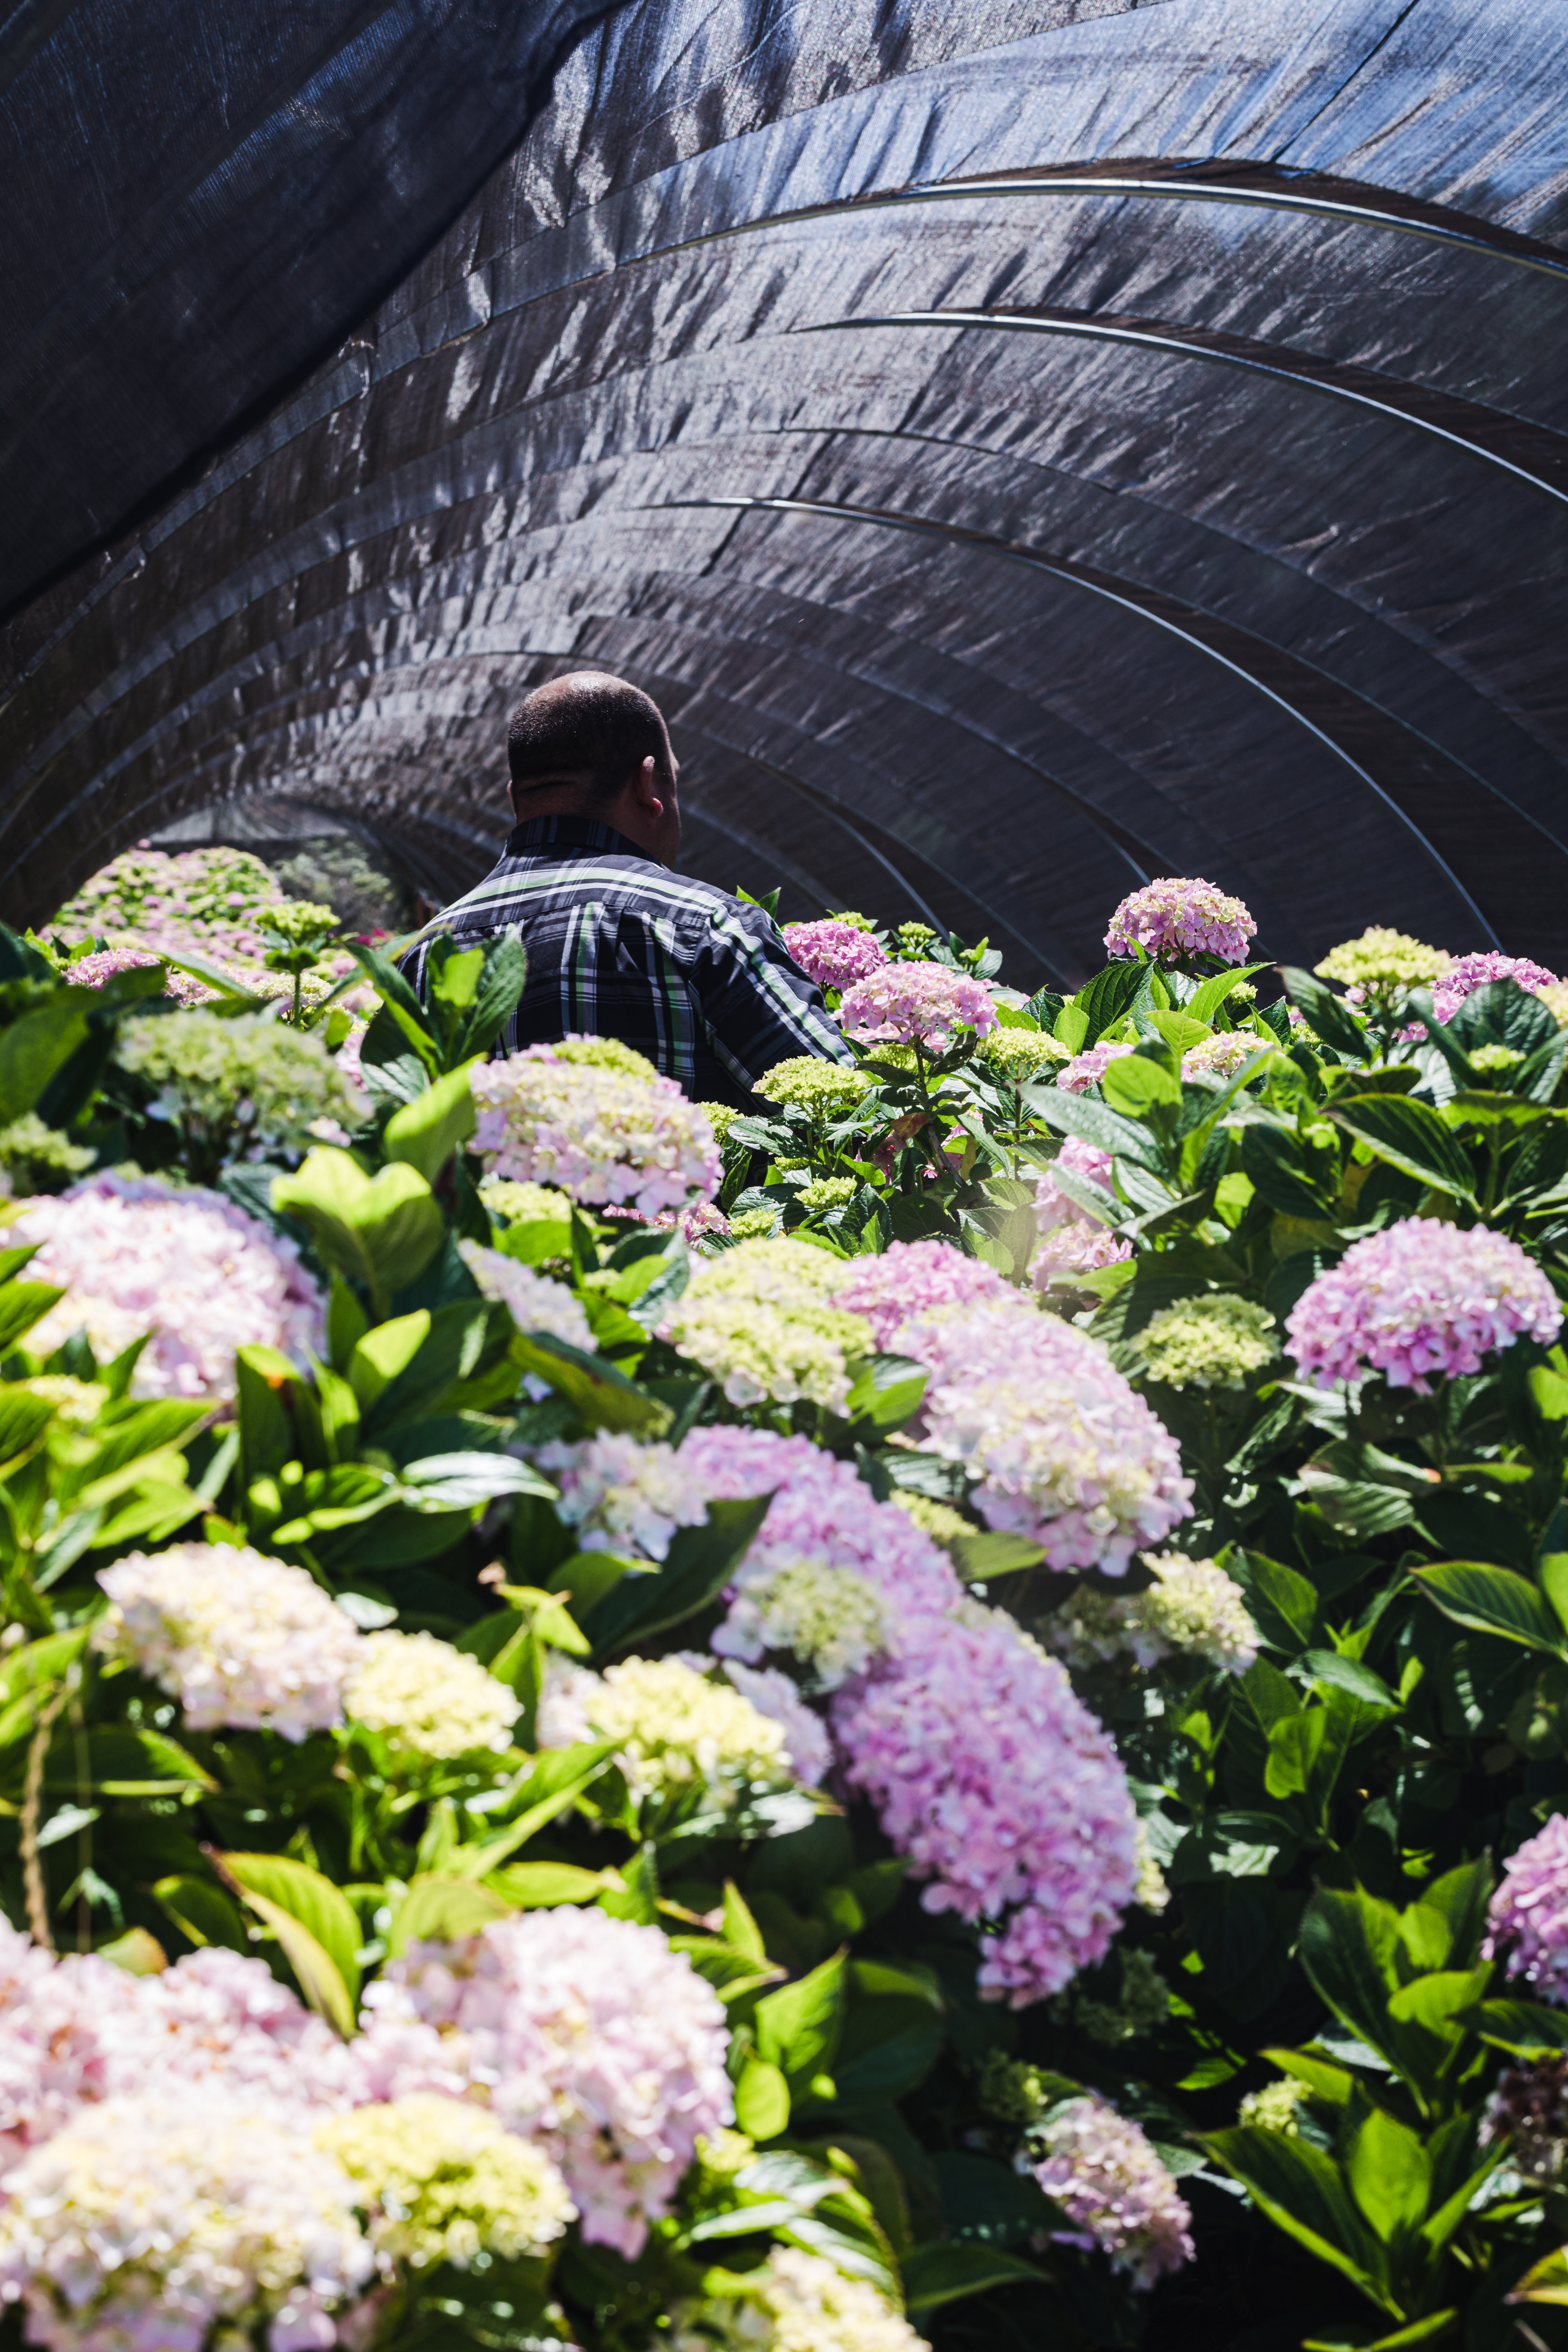 Javier Zamora, of JSM Organics, walking through freshly growing flowers.